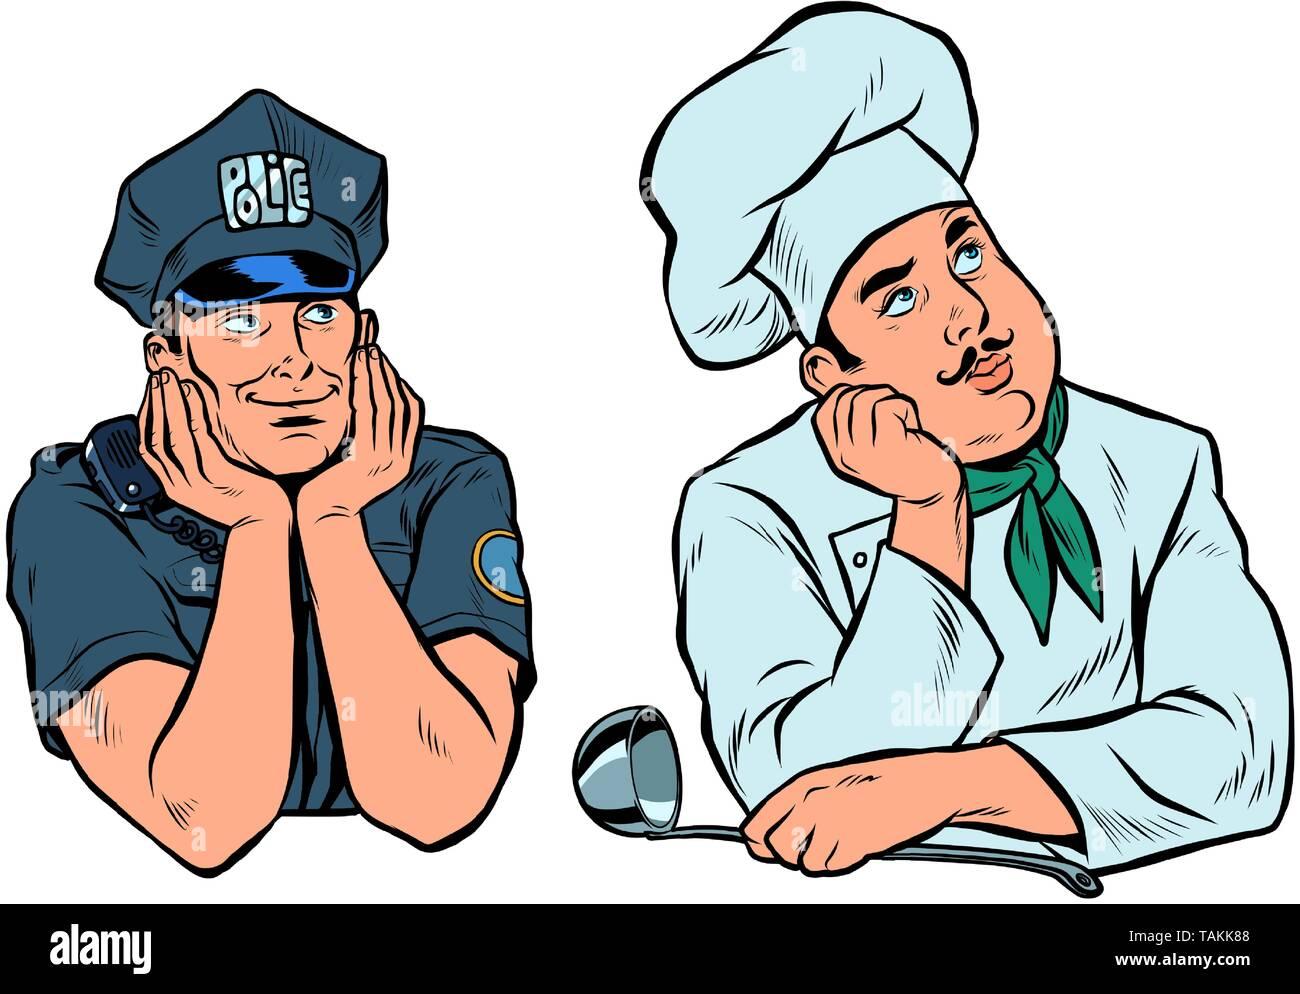 dreaming man, policeman and cook set. Pop art retro vector illustration vintage kitsch - Stock Image